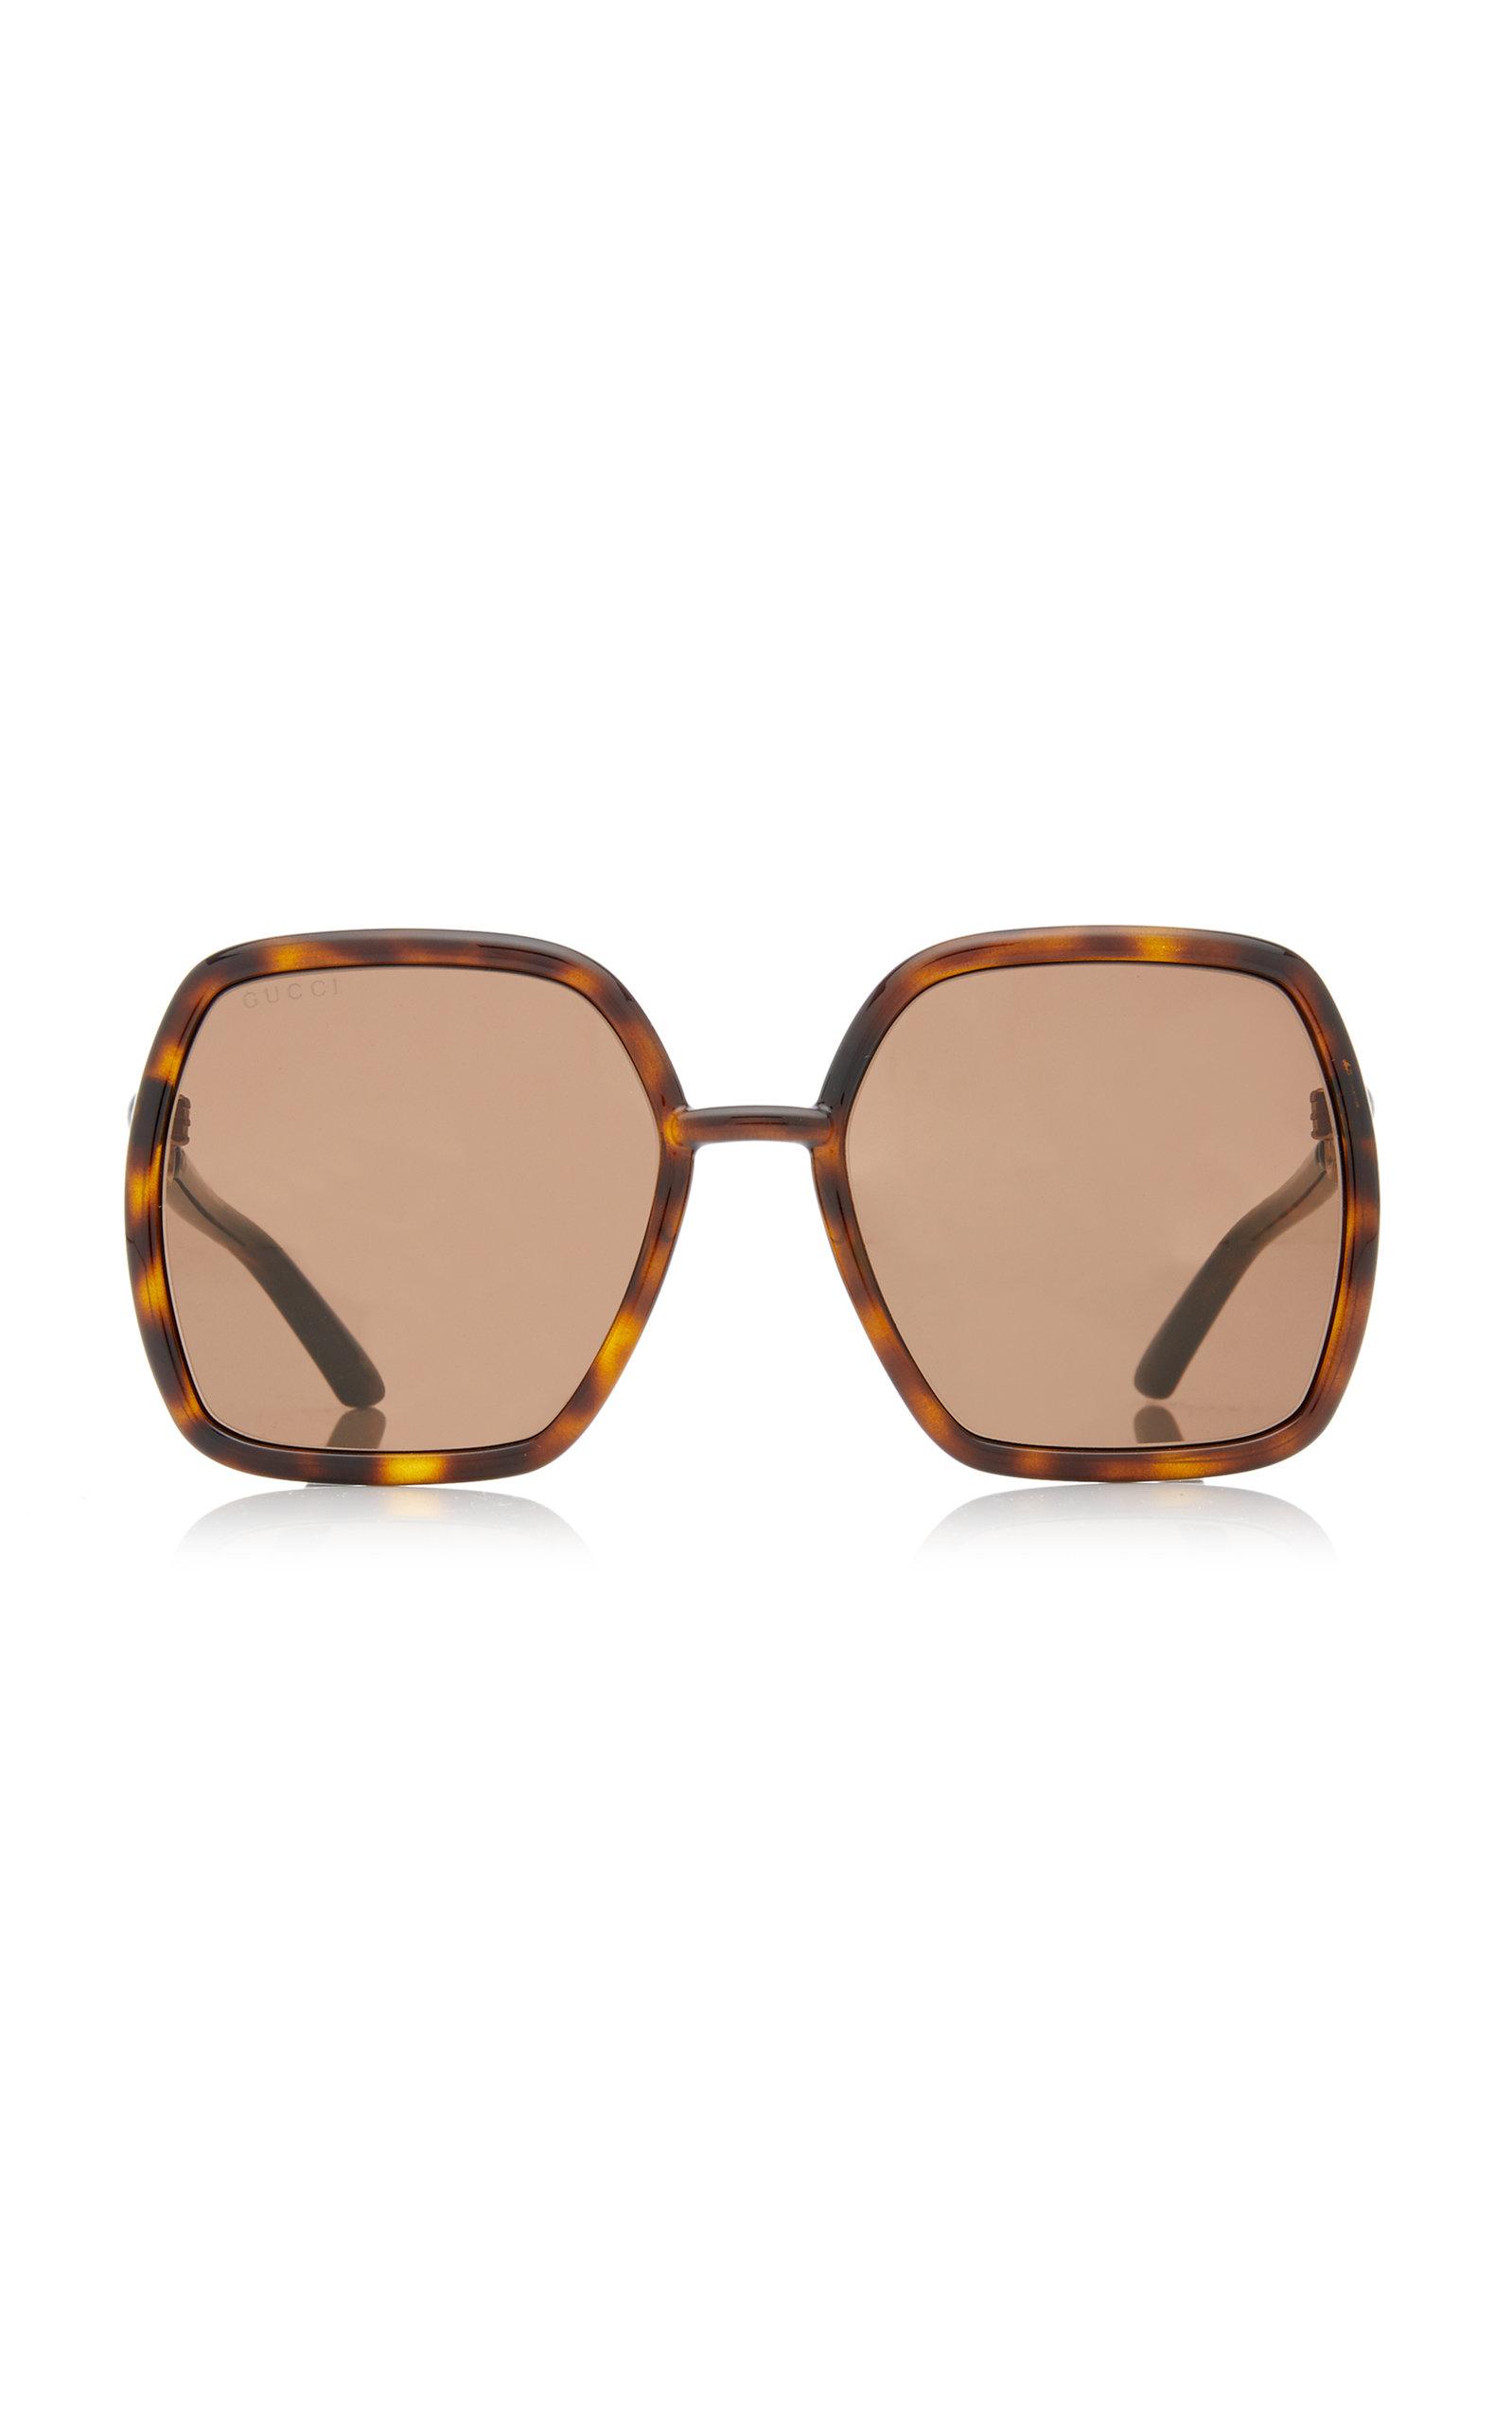 Gucci - Women's Oversized Square-Frame Injection Sunglasses - Pink/brown - Moda Operandi